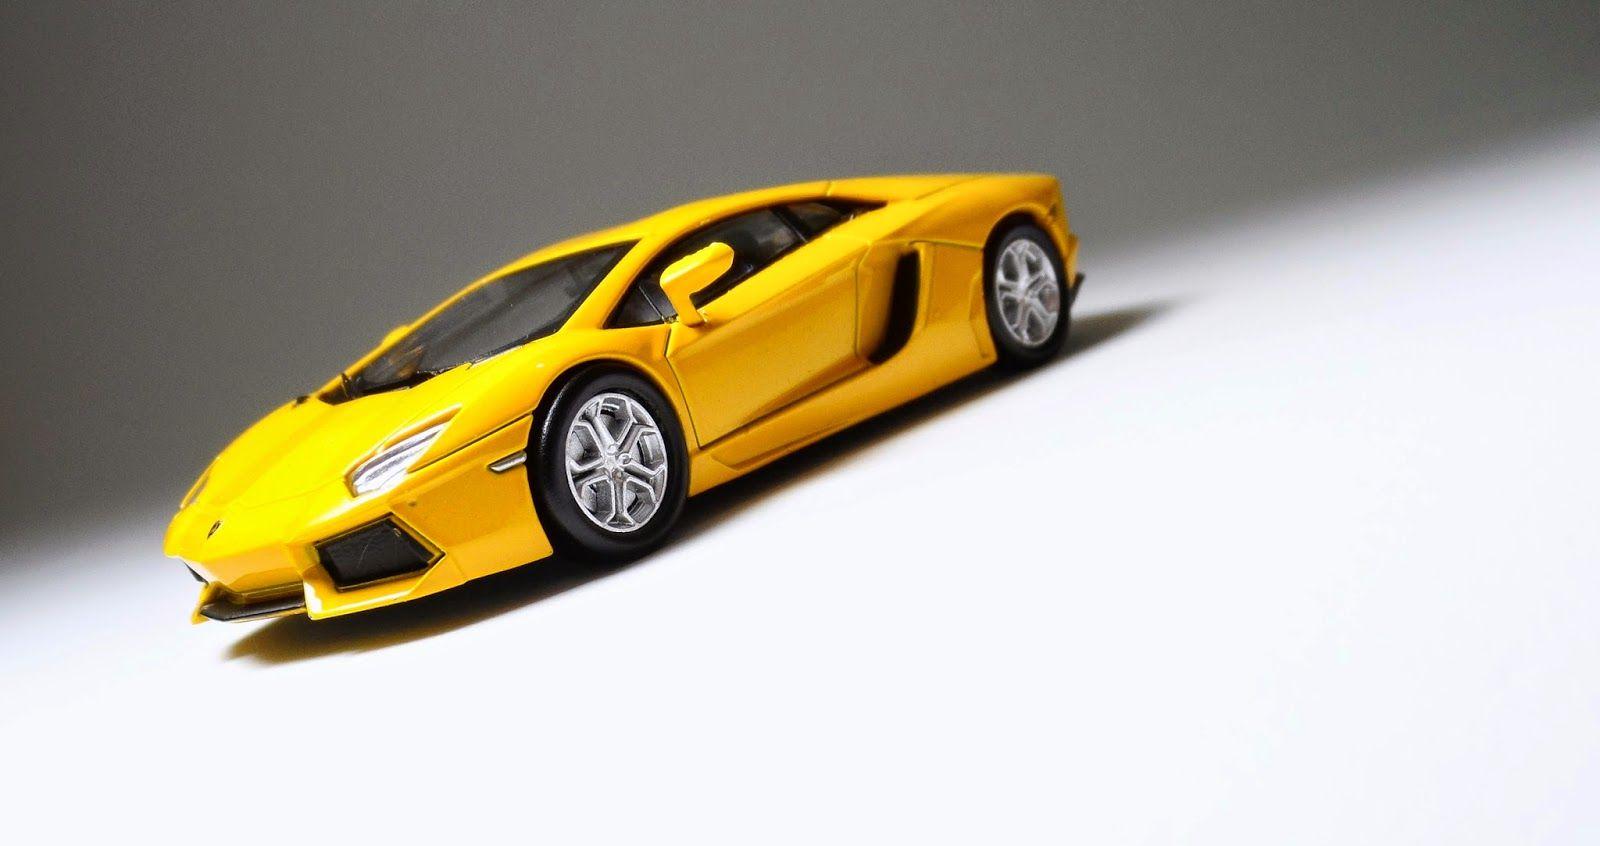 Lamborghini Aventador LP700-4 (Amarela) - OEM Kyosho.